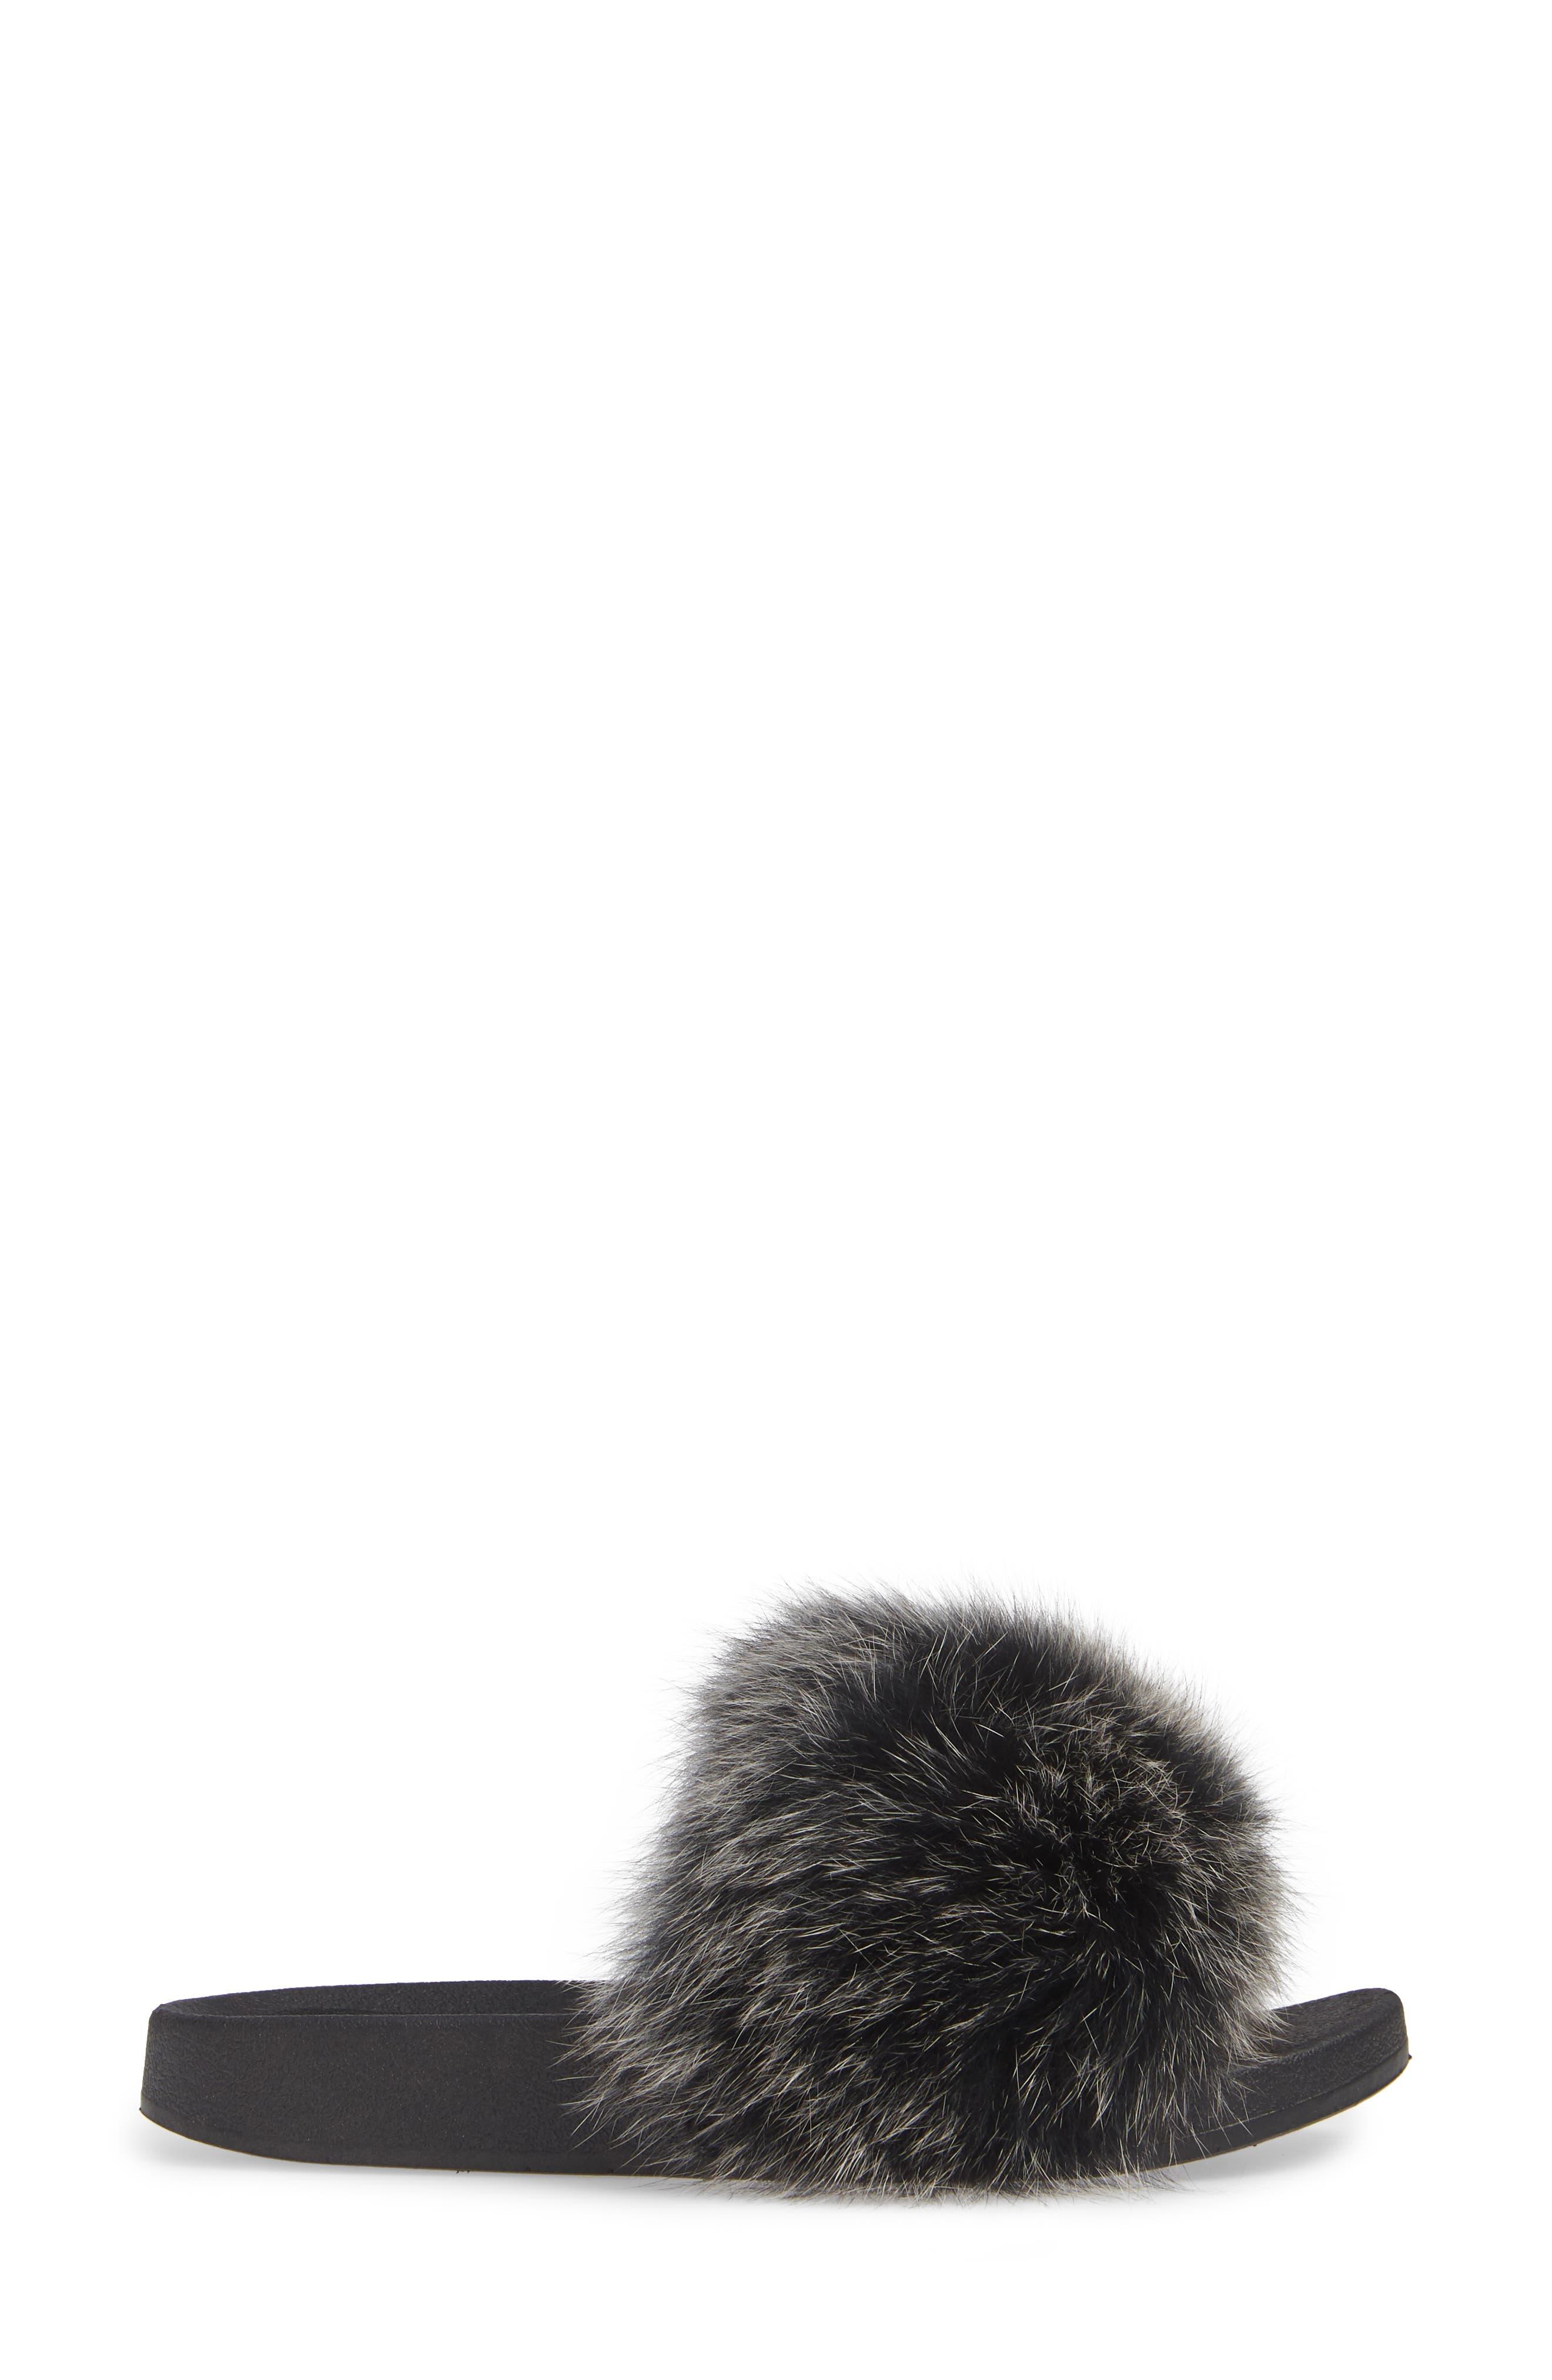 PATRICIA GREEN, Foxy Genuine Fox Fur Slipper, Alternate thumbnail 3, color, BLACK/ WHITE FUR